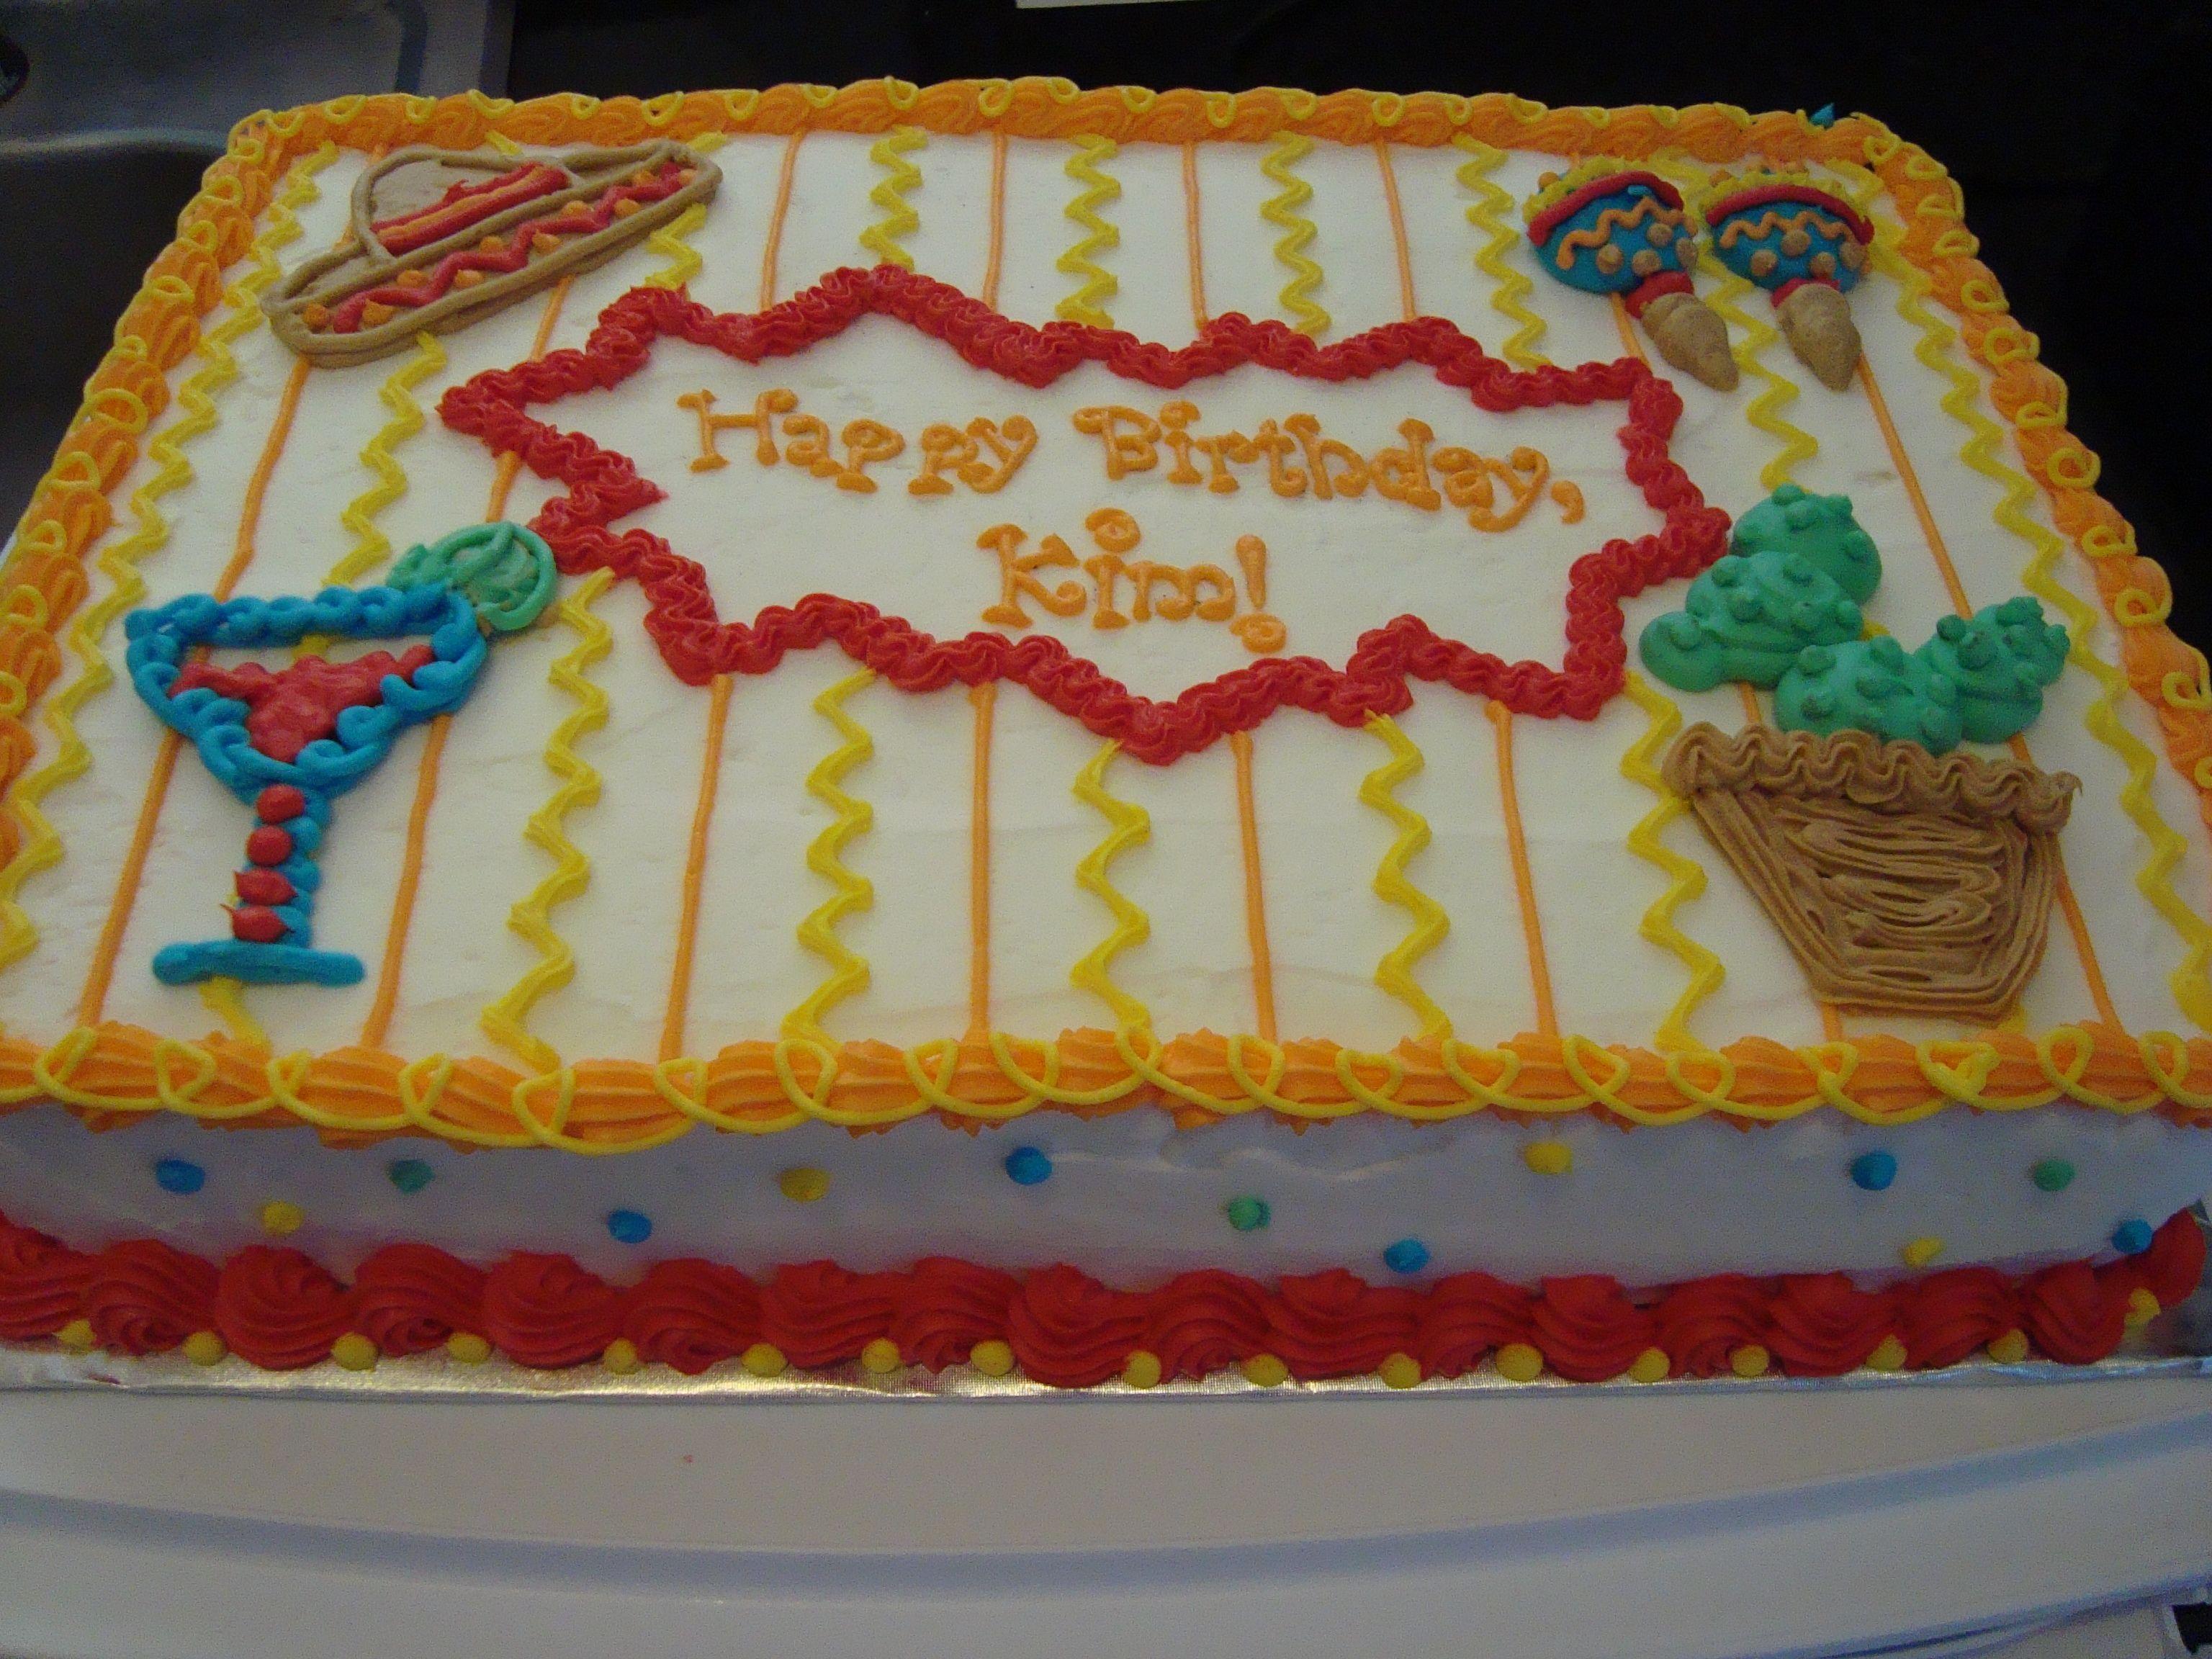 Fiesta Birthday - All buttercream, 1/4 sheet cake